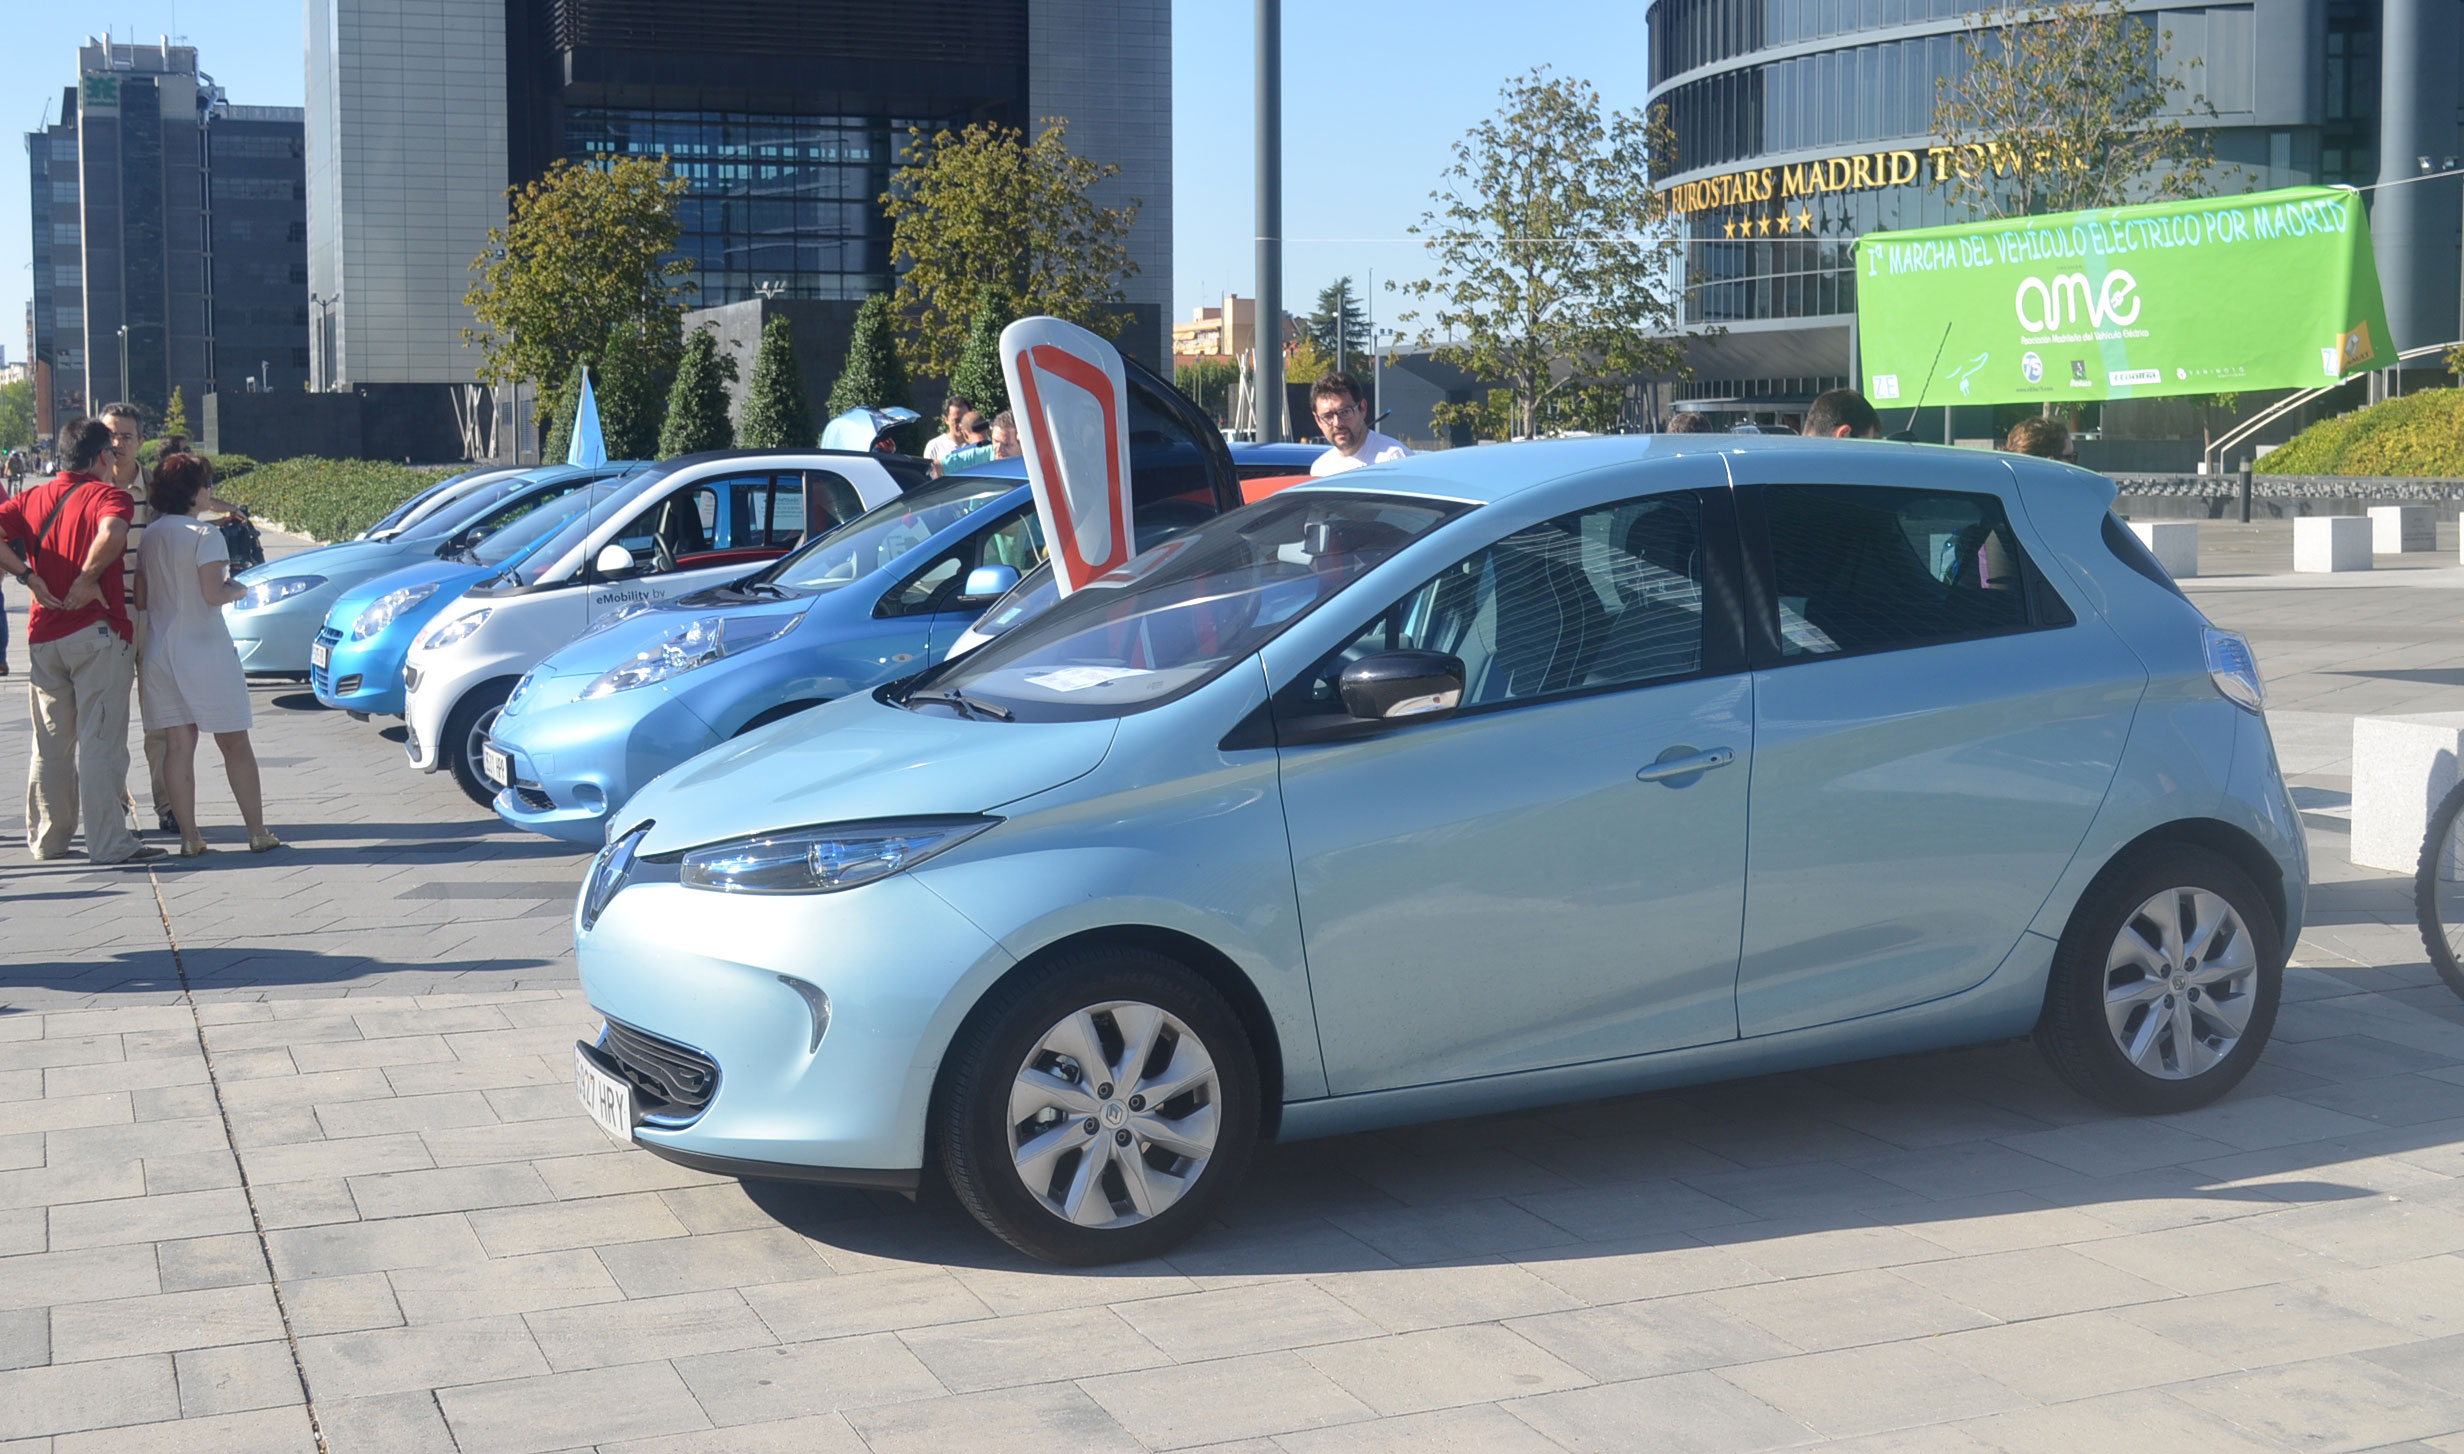 VEM2015 se moverá con energía 100% renovable